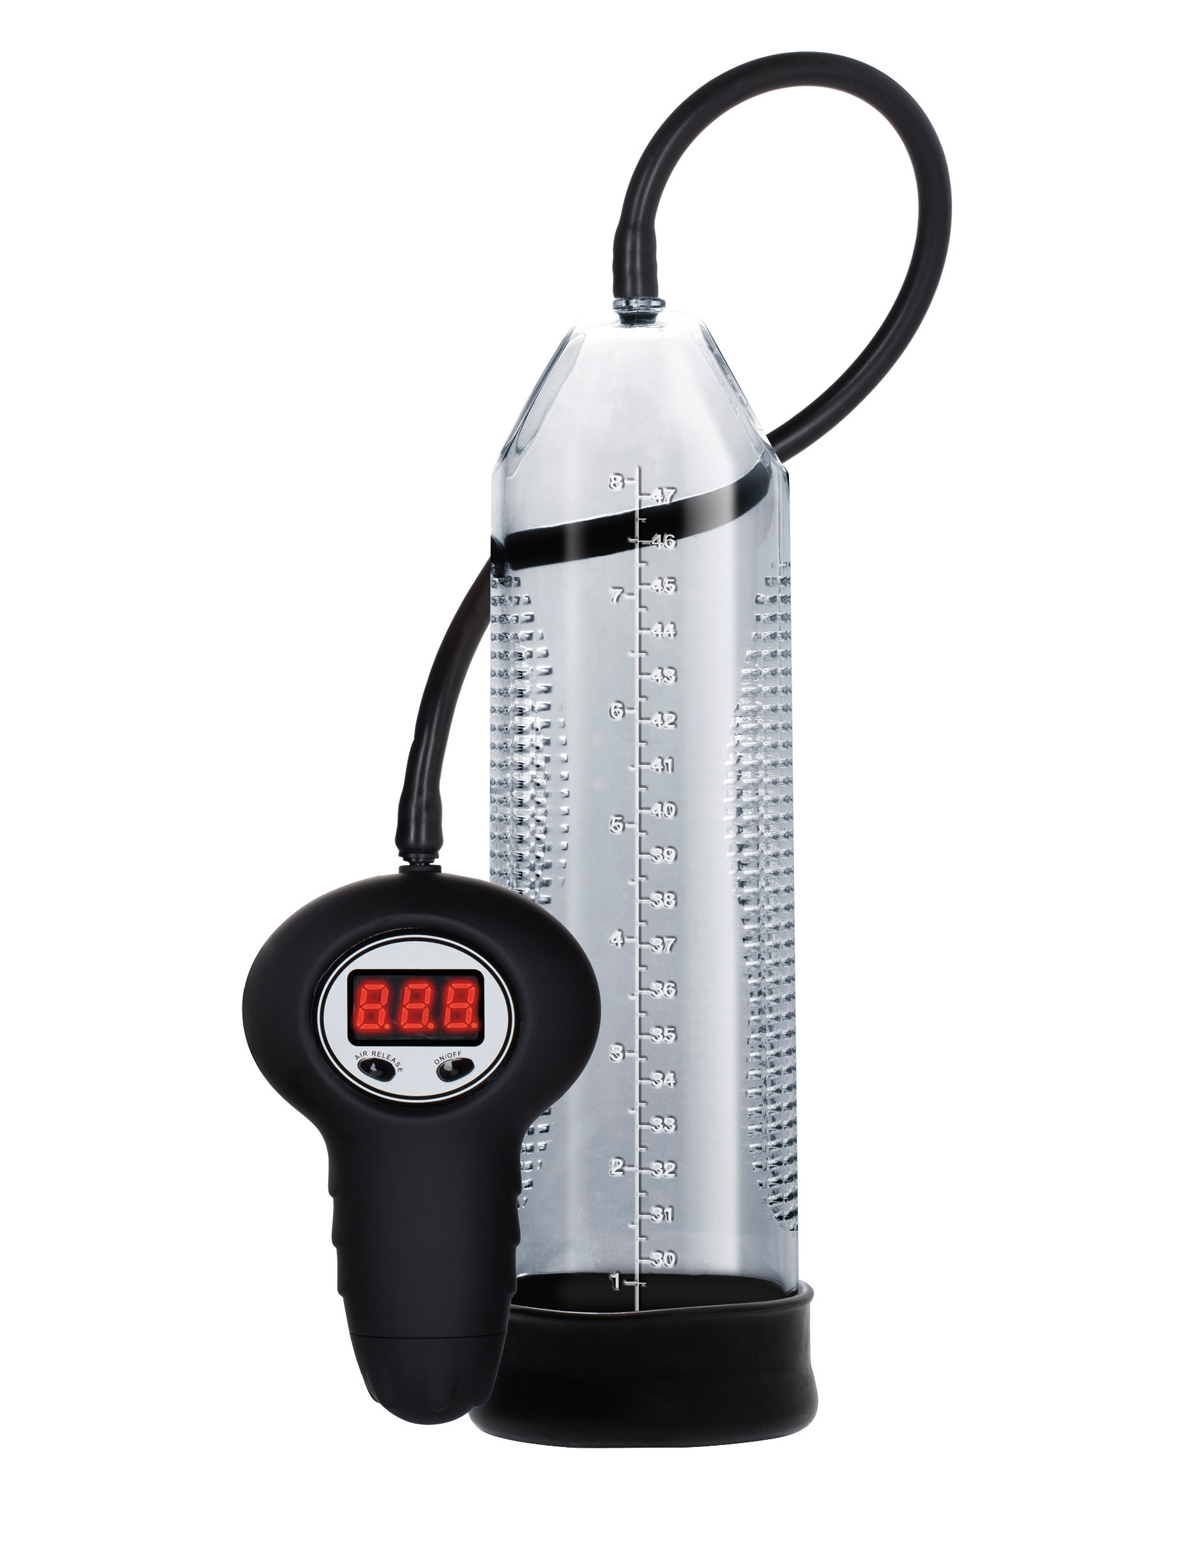 Automatic Power Pump